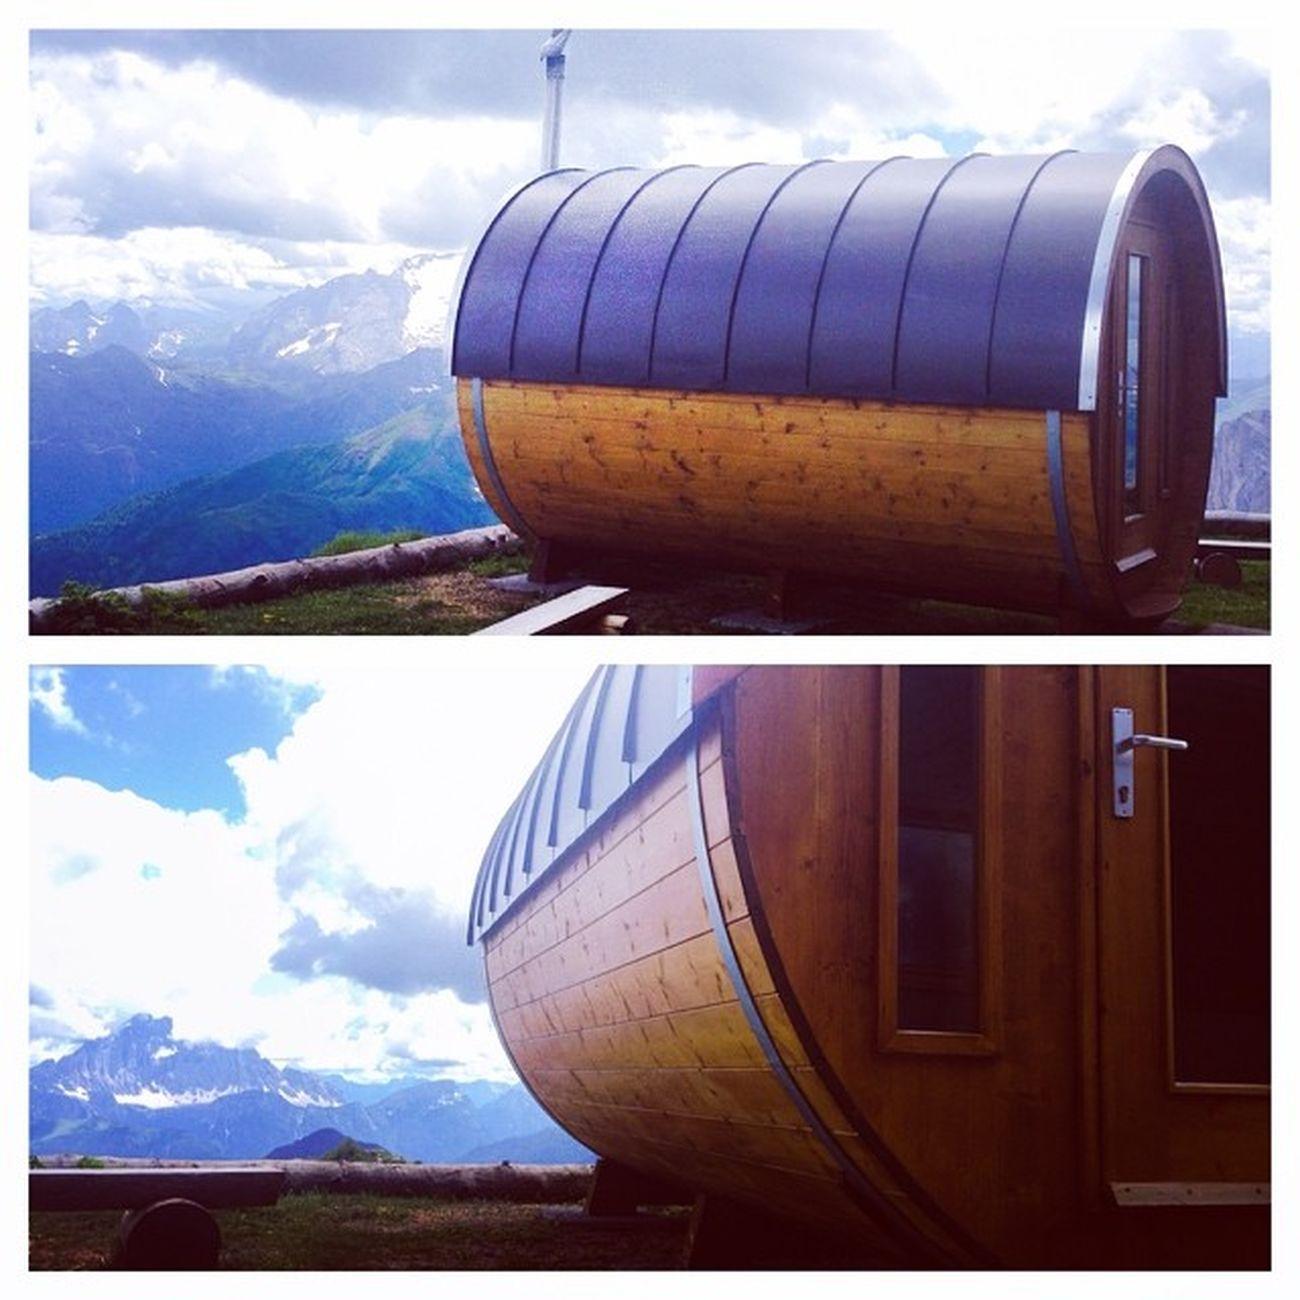 Sauna Wellness Iphonography Alps Alpi Instalife Dolomiti Lifeisbeautiful Webstapick LifeLessOrdinary Meshpics Lagazuoi